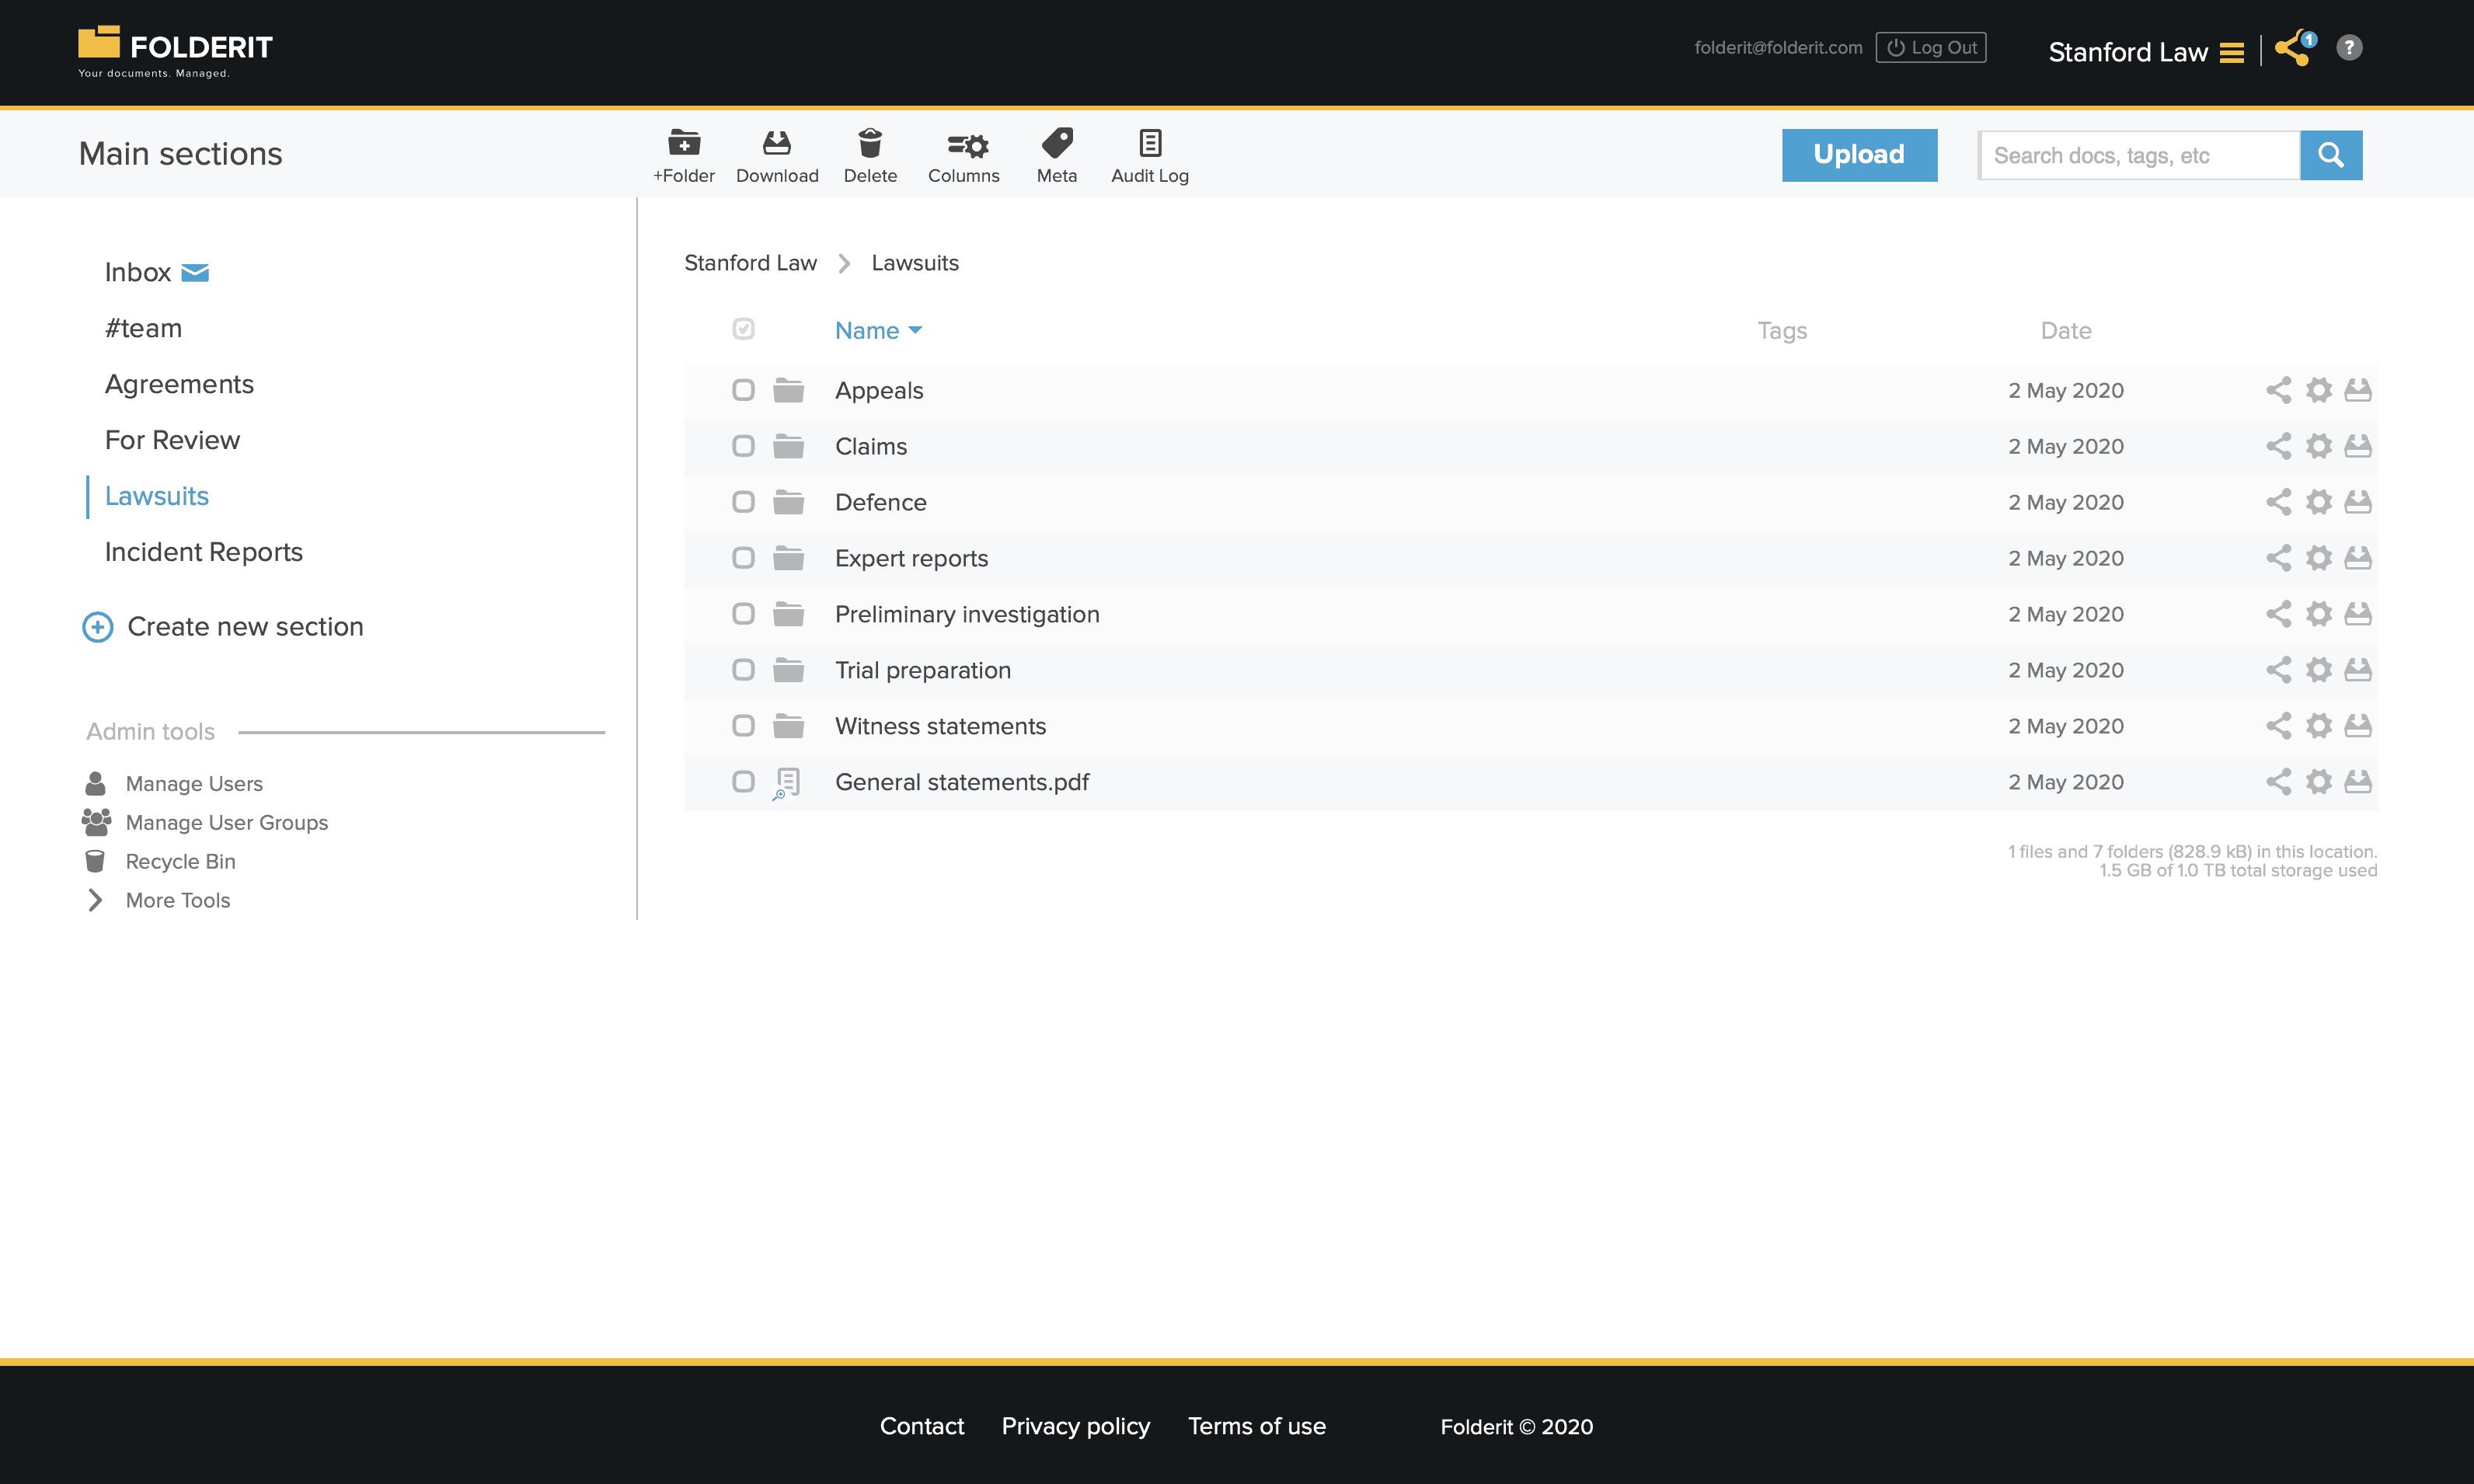 Litigation documentation management system software Folderit interface